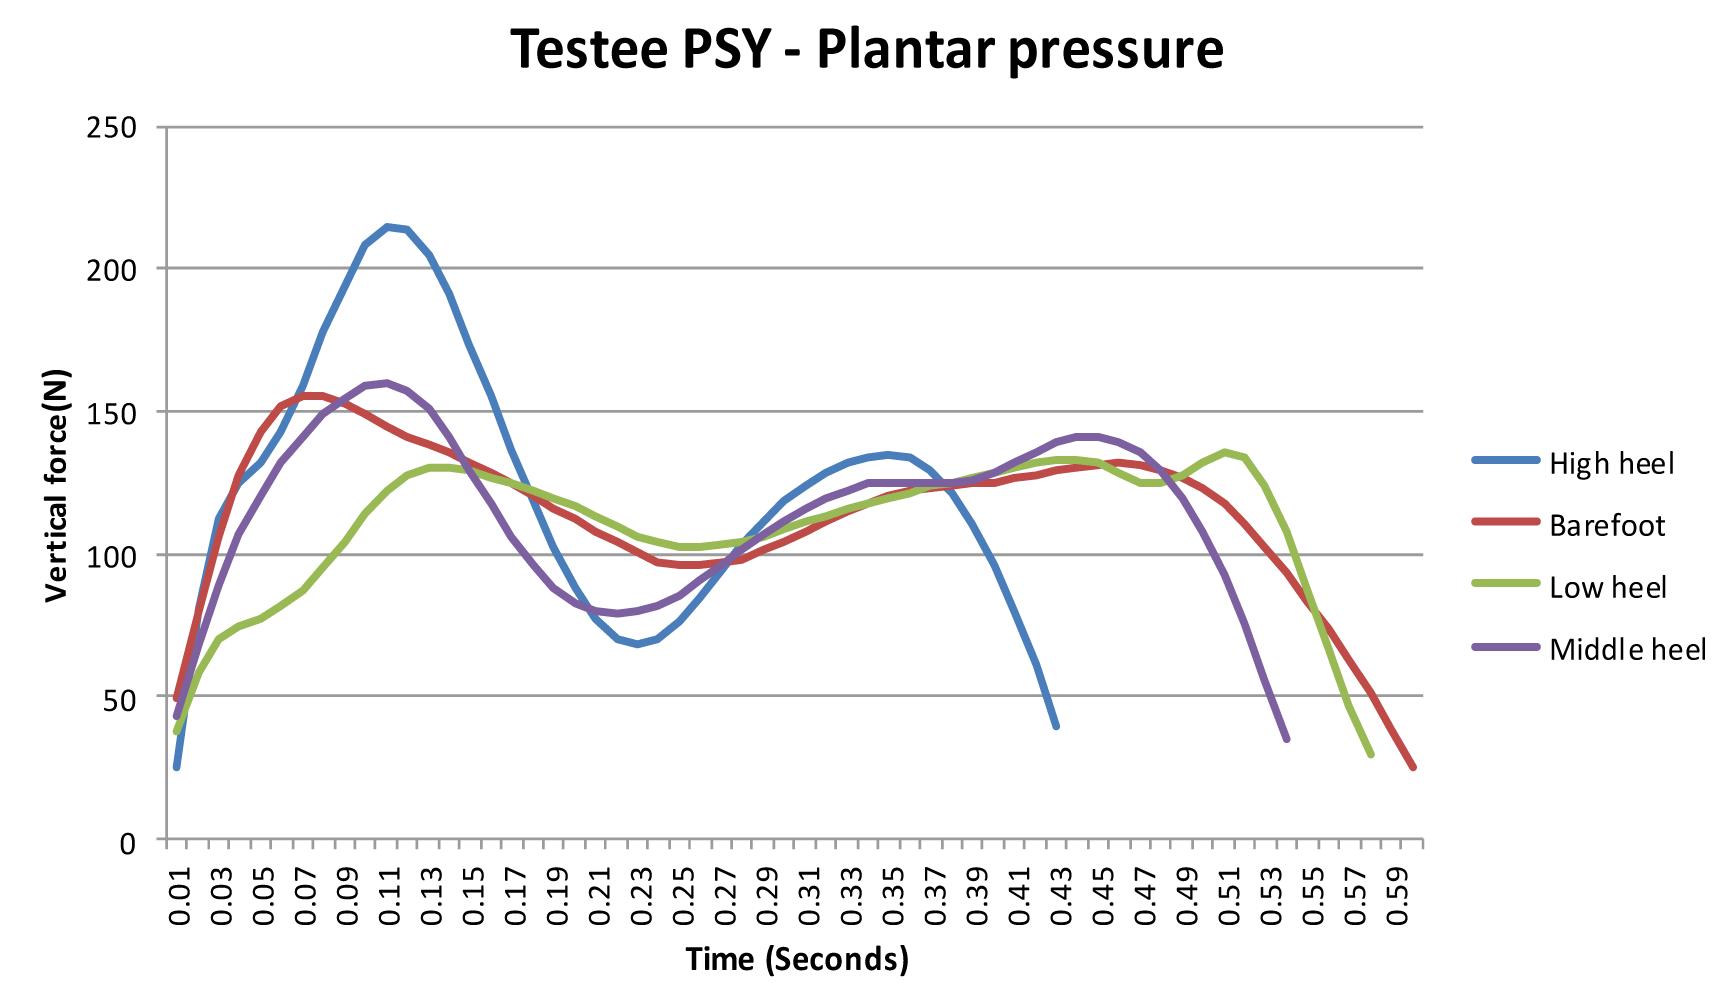 Testee PSY - Plantar pressure